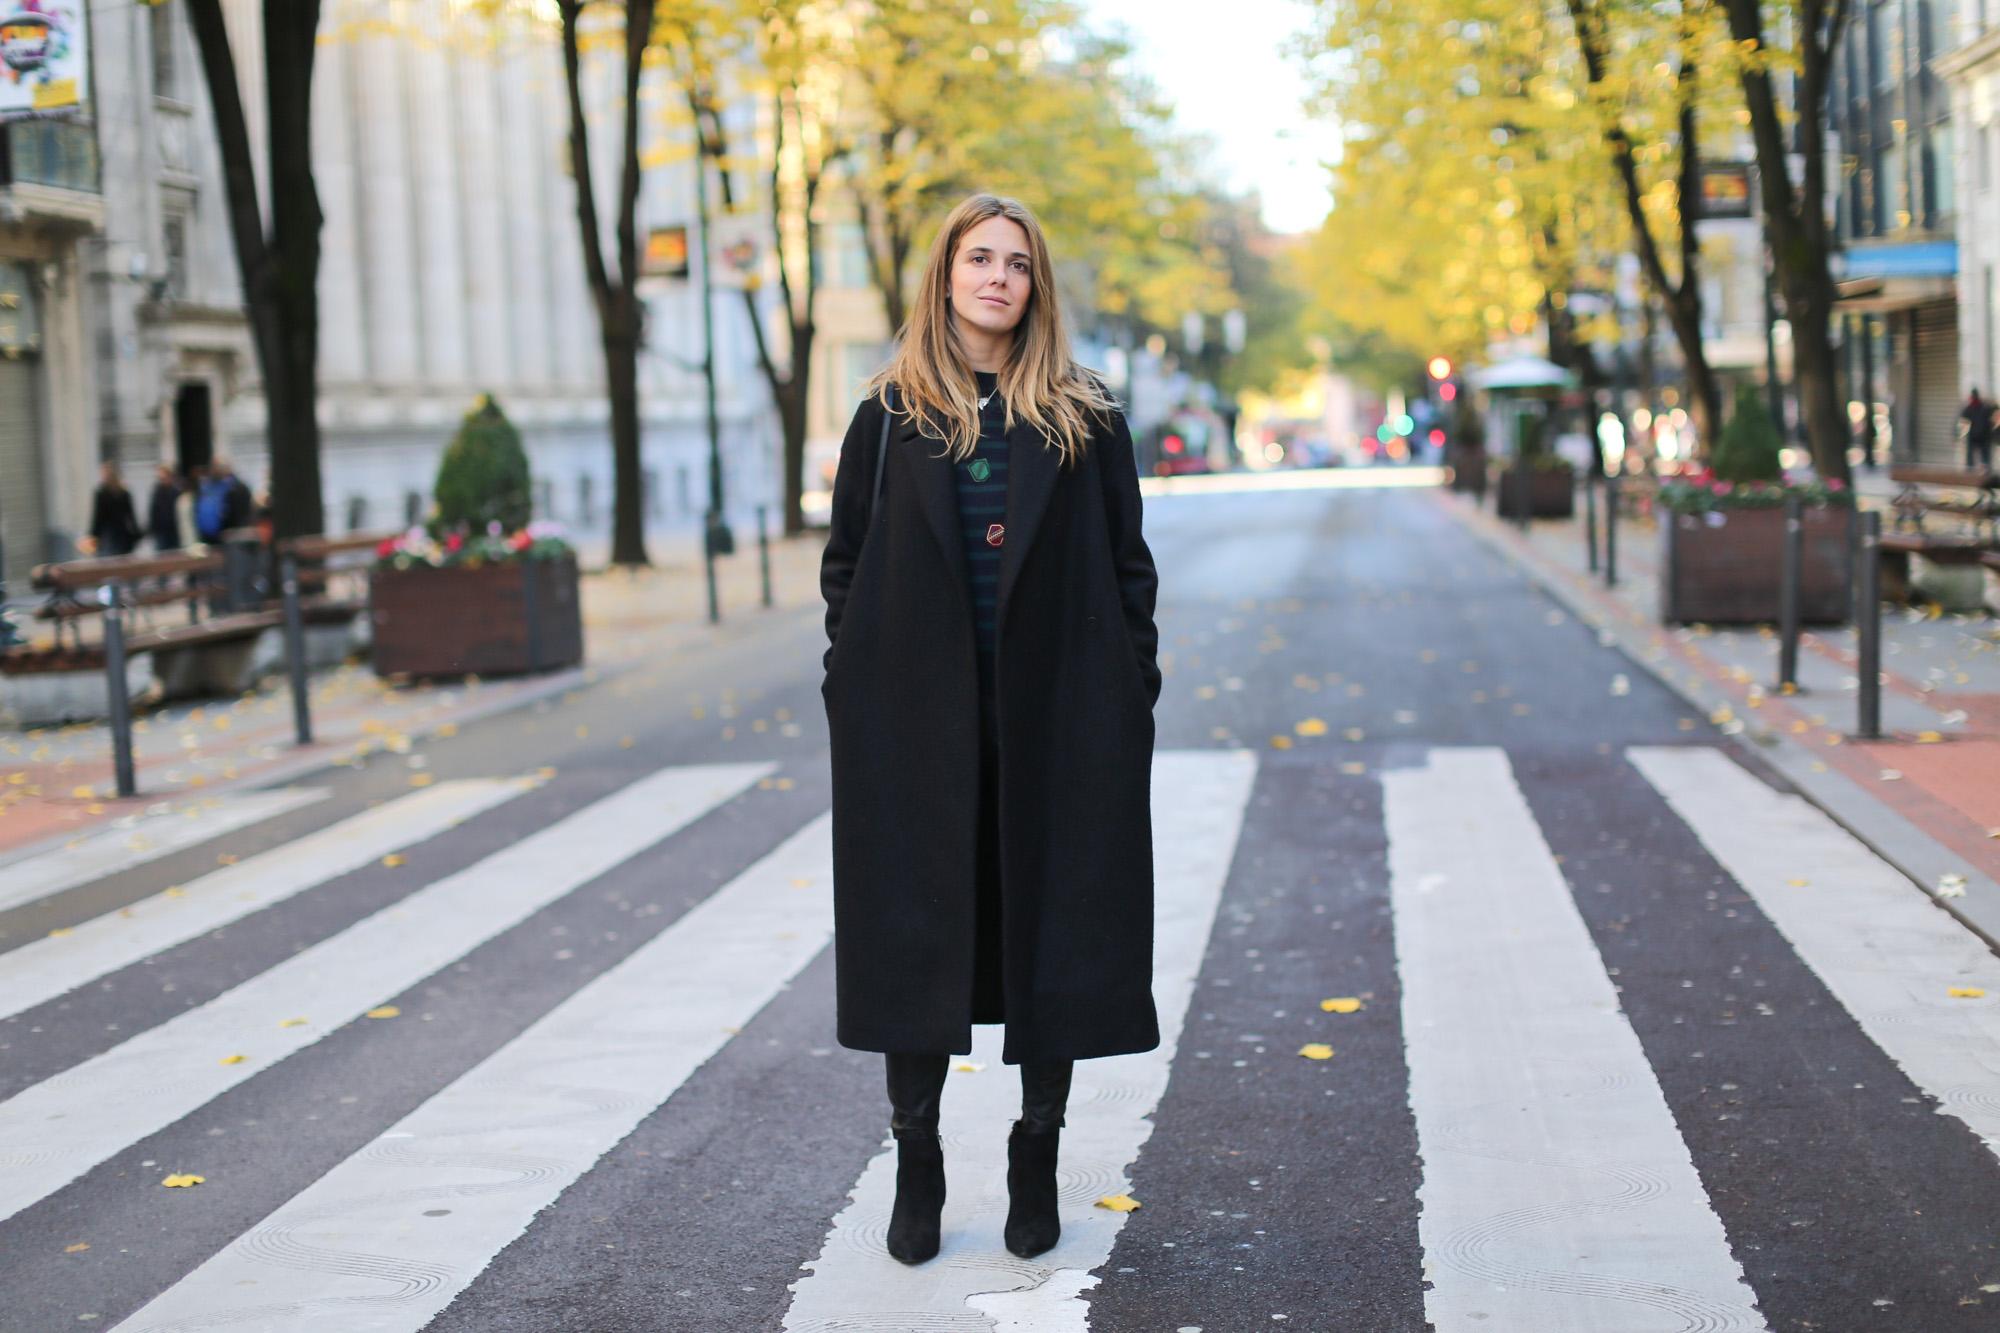 Clochet_fashionblogger_streetstyle_claudiepierlot_stripedknit_andotherstories_suedestilettoankleboots_coslongwoolcoat-2